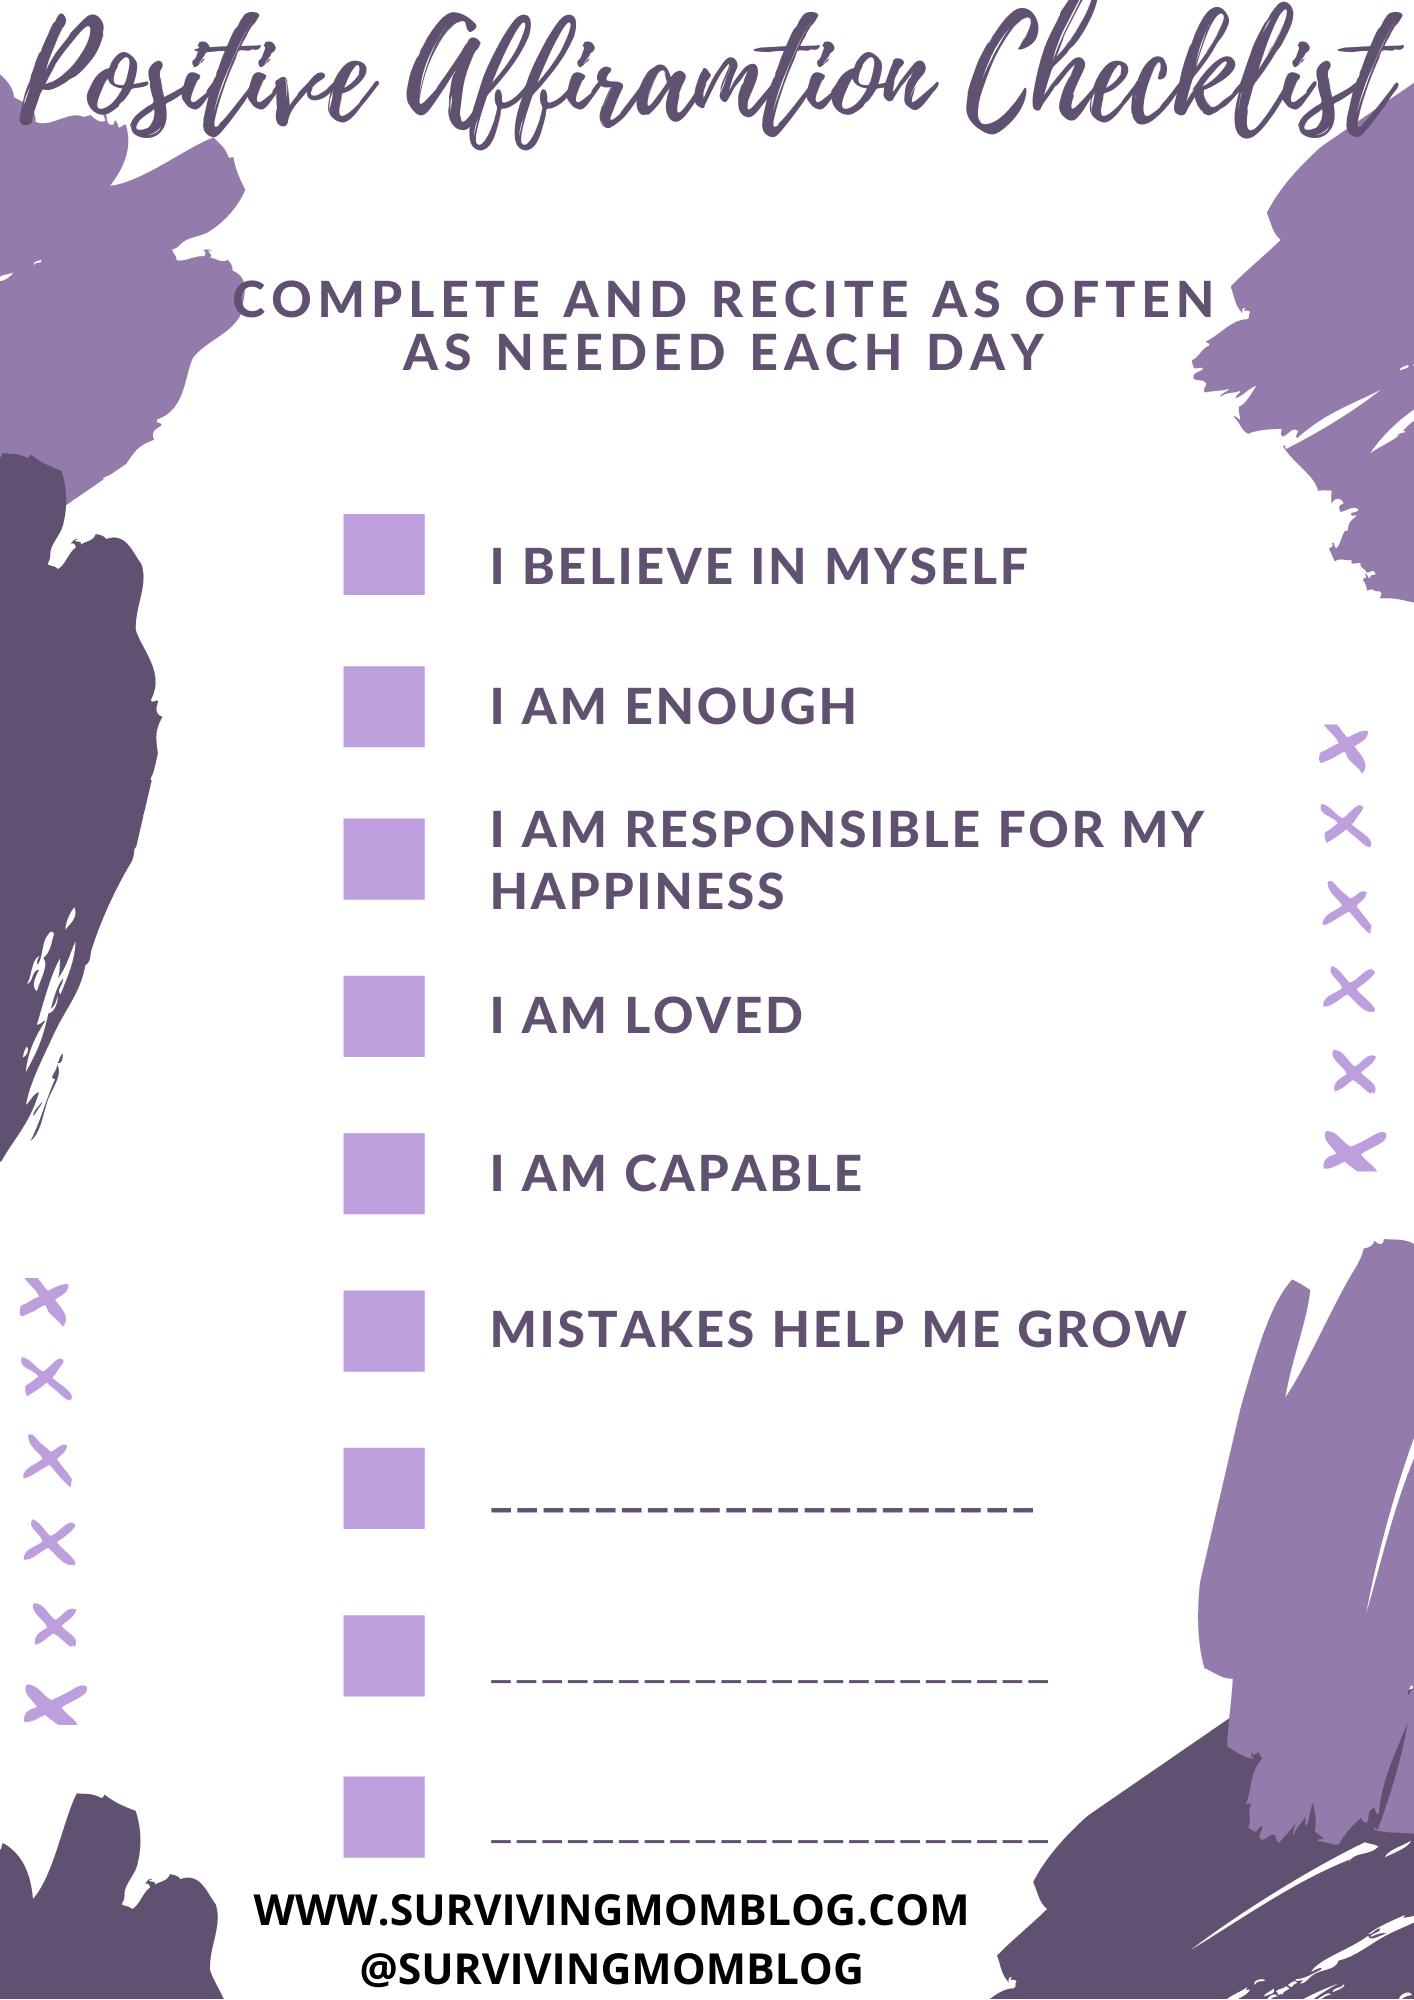 self love - positive affirmation checklist